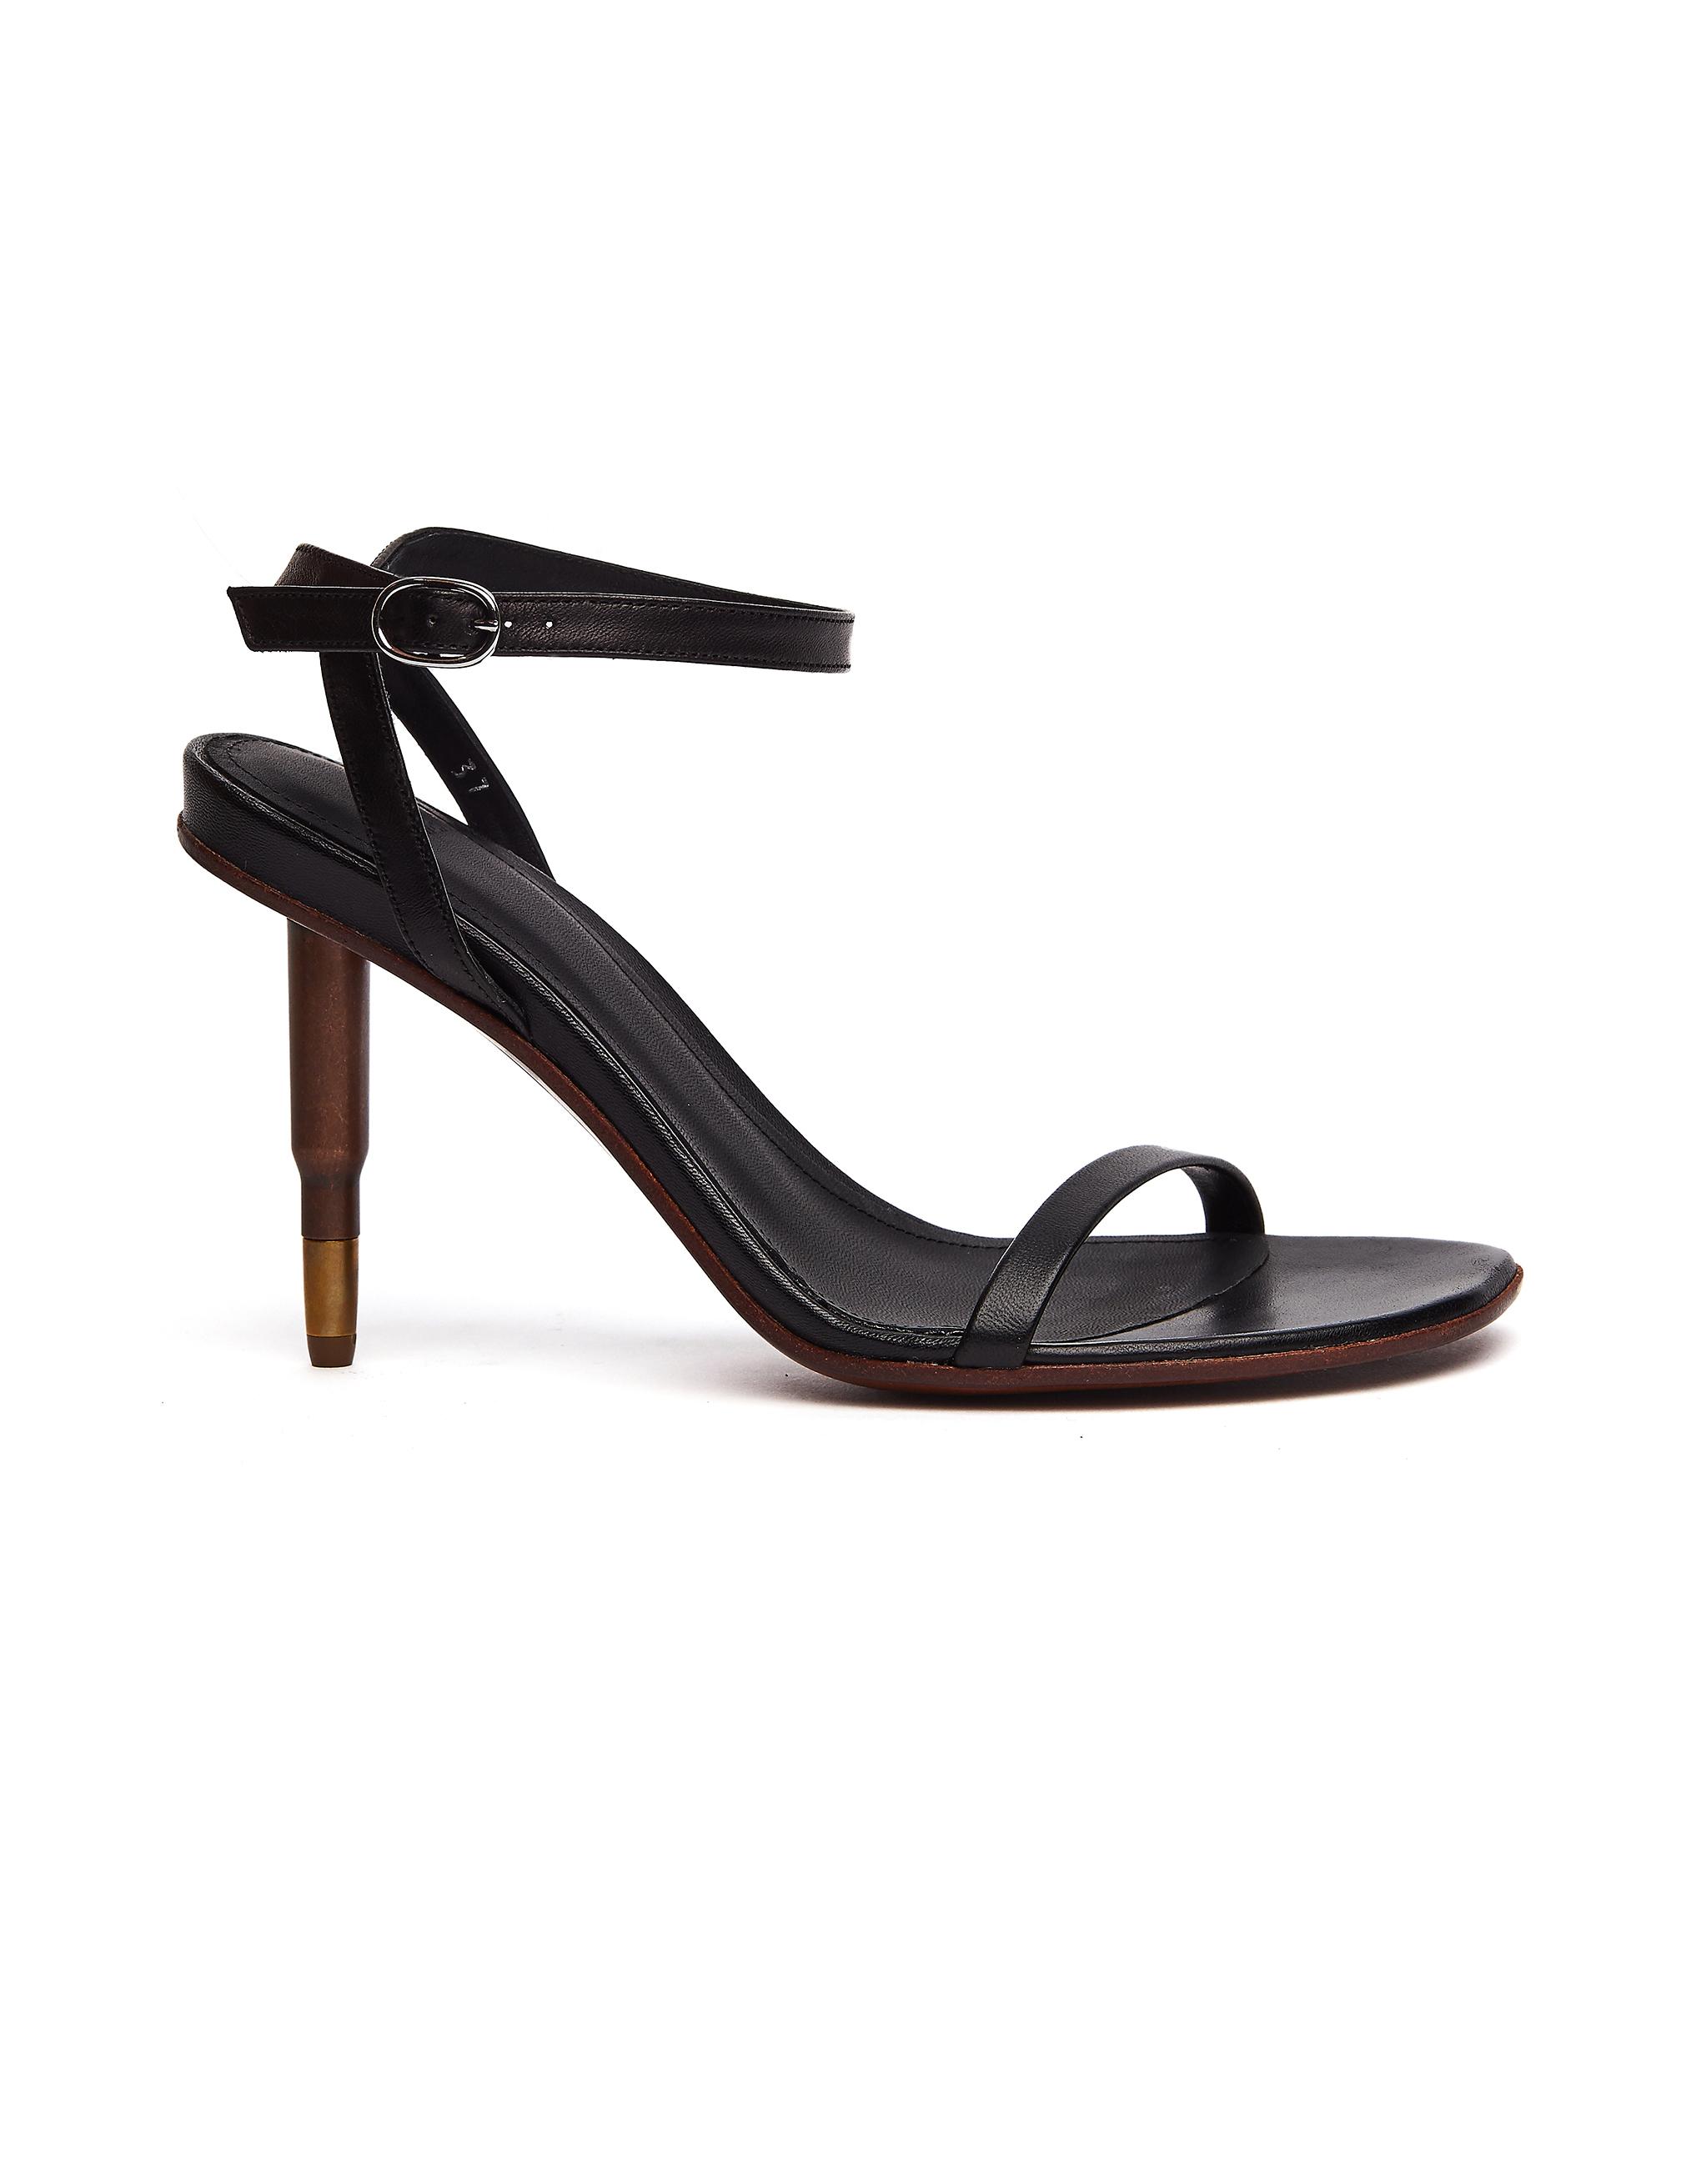 Vetements Killer Black Leather Bullet-heels Sandals